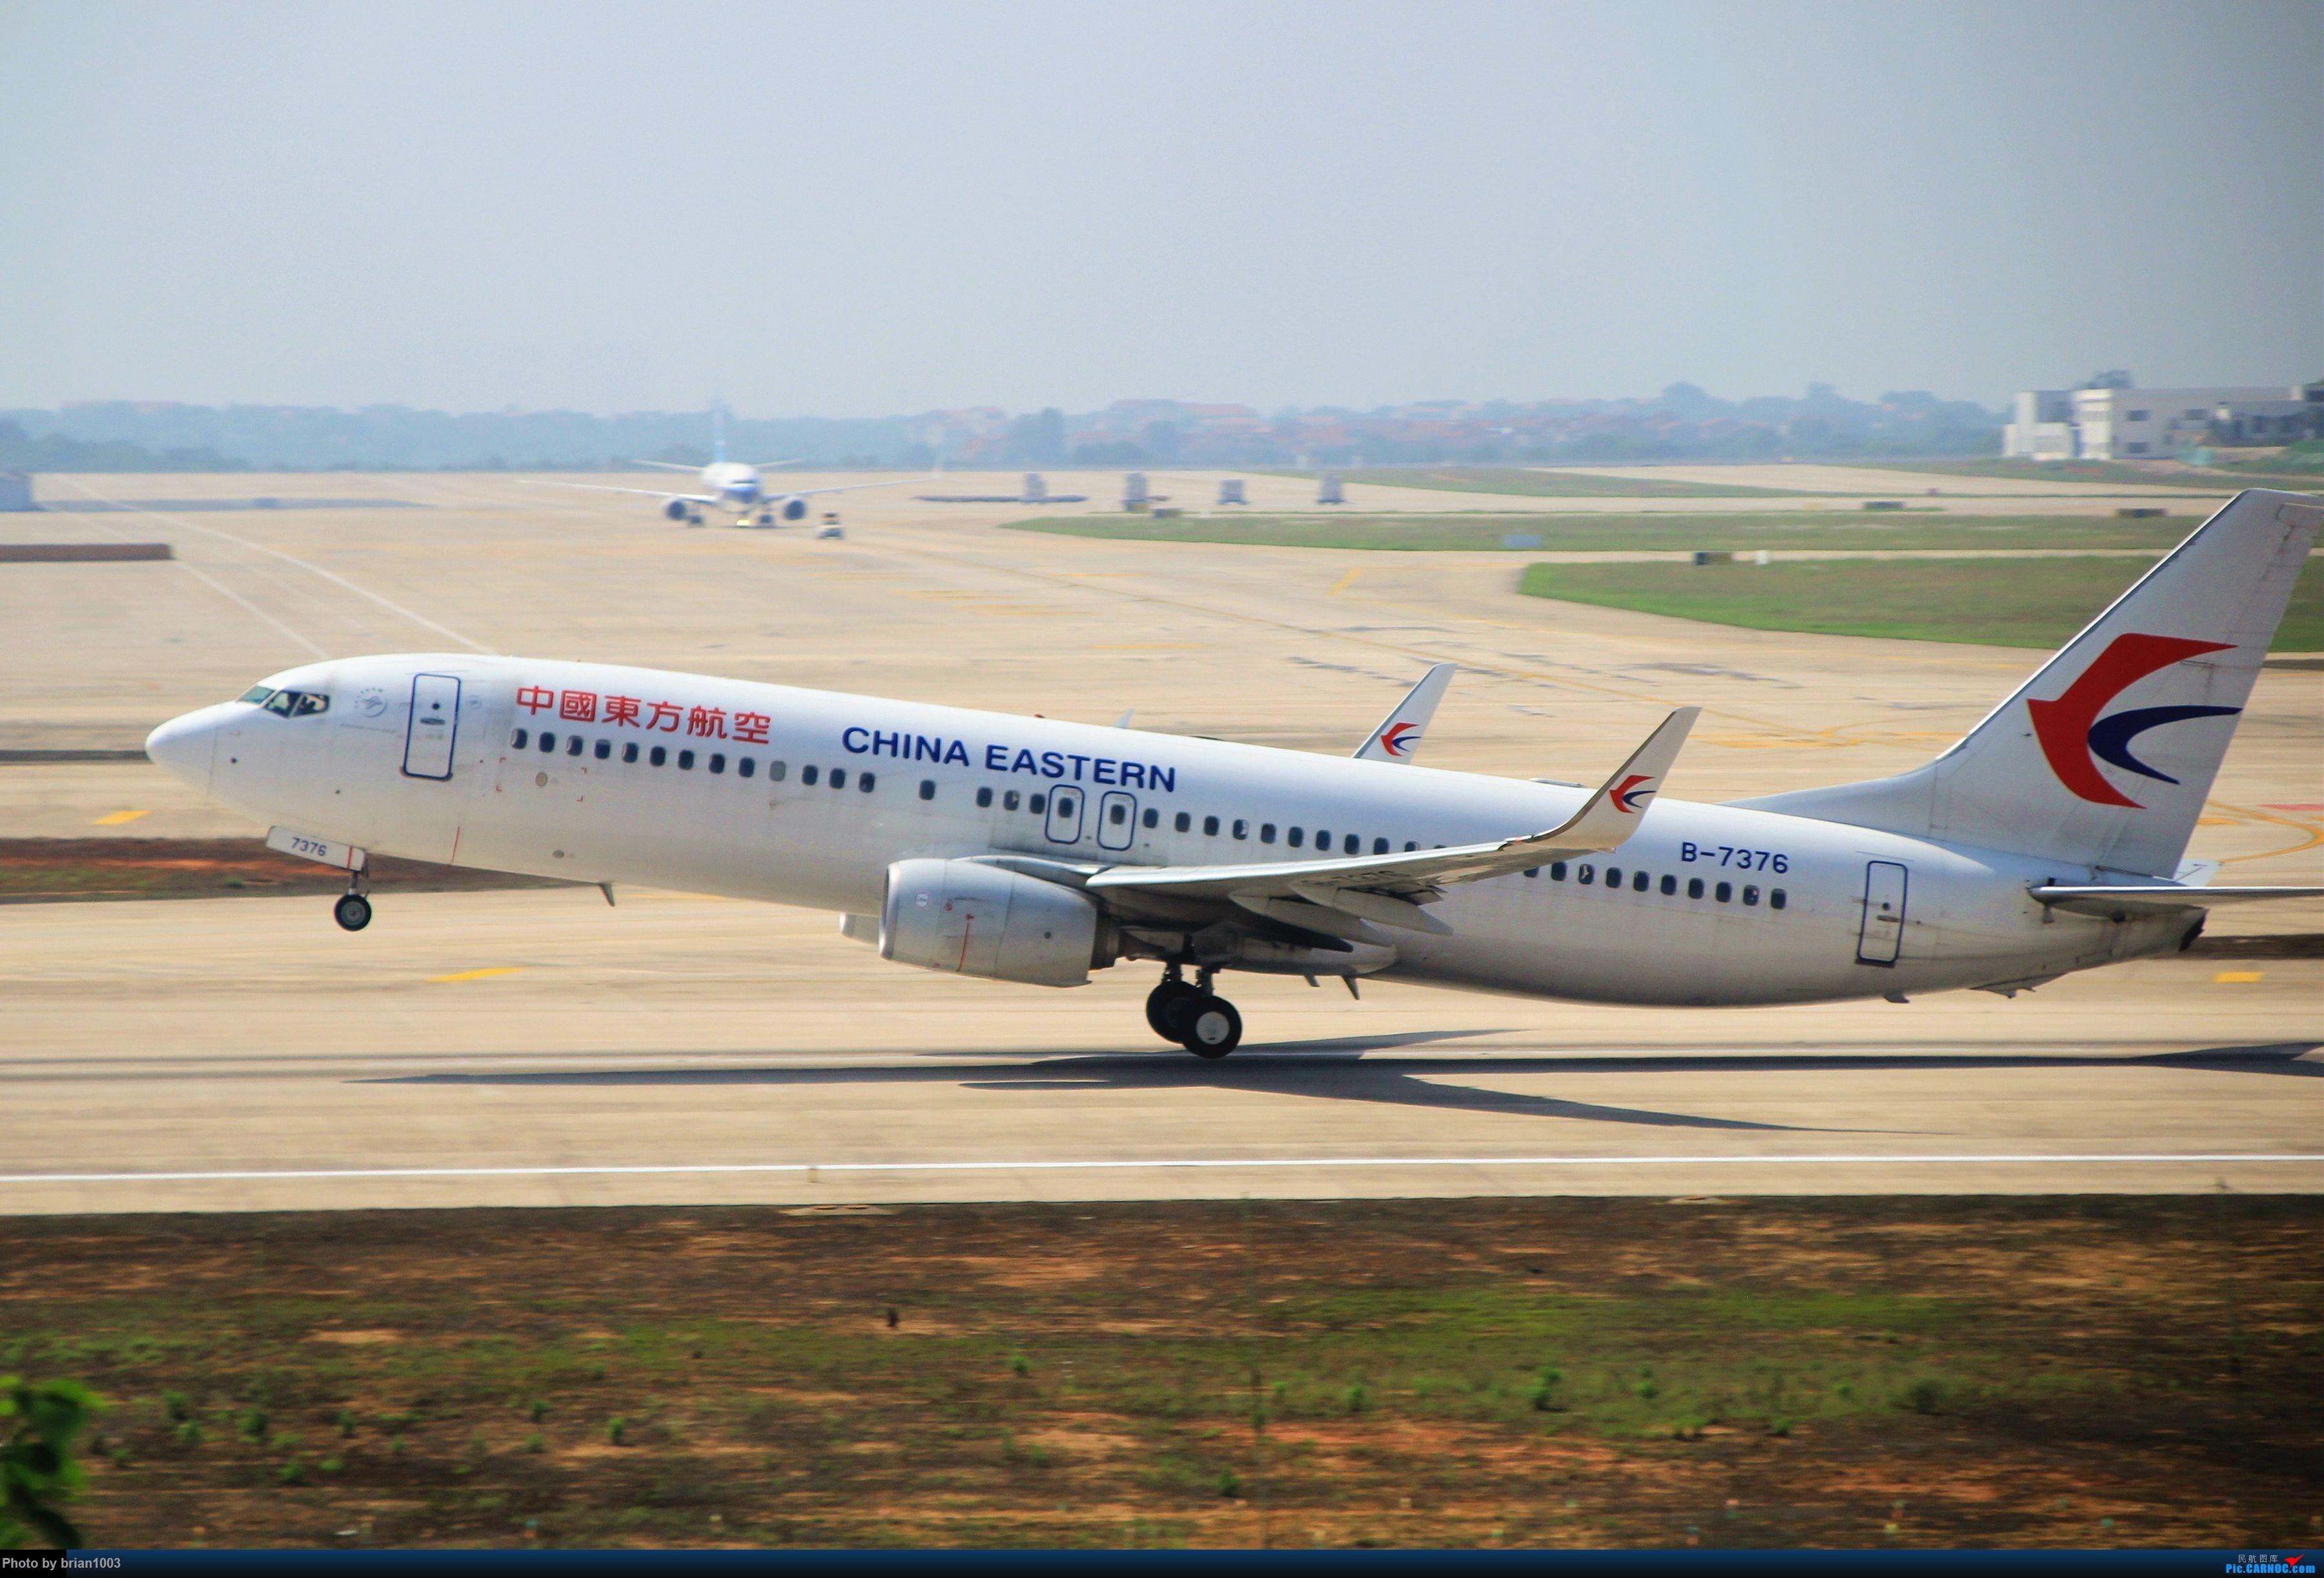 Re:[原创]WUH武汉天河机场拍机之喜迎酷航788和偶遇某其他飞机 BOEING 737-800 B-7376